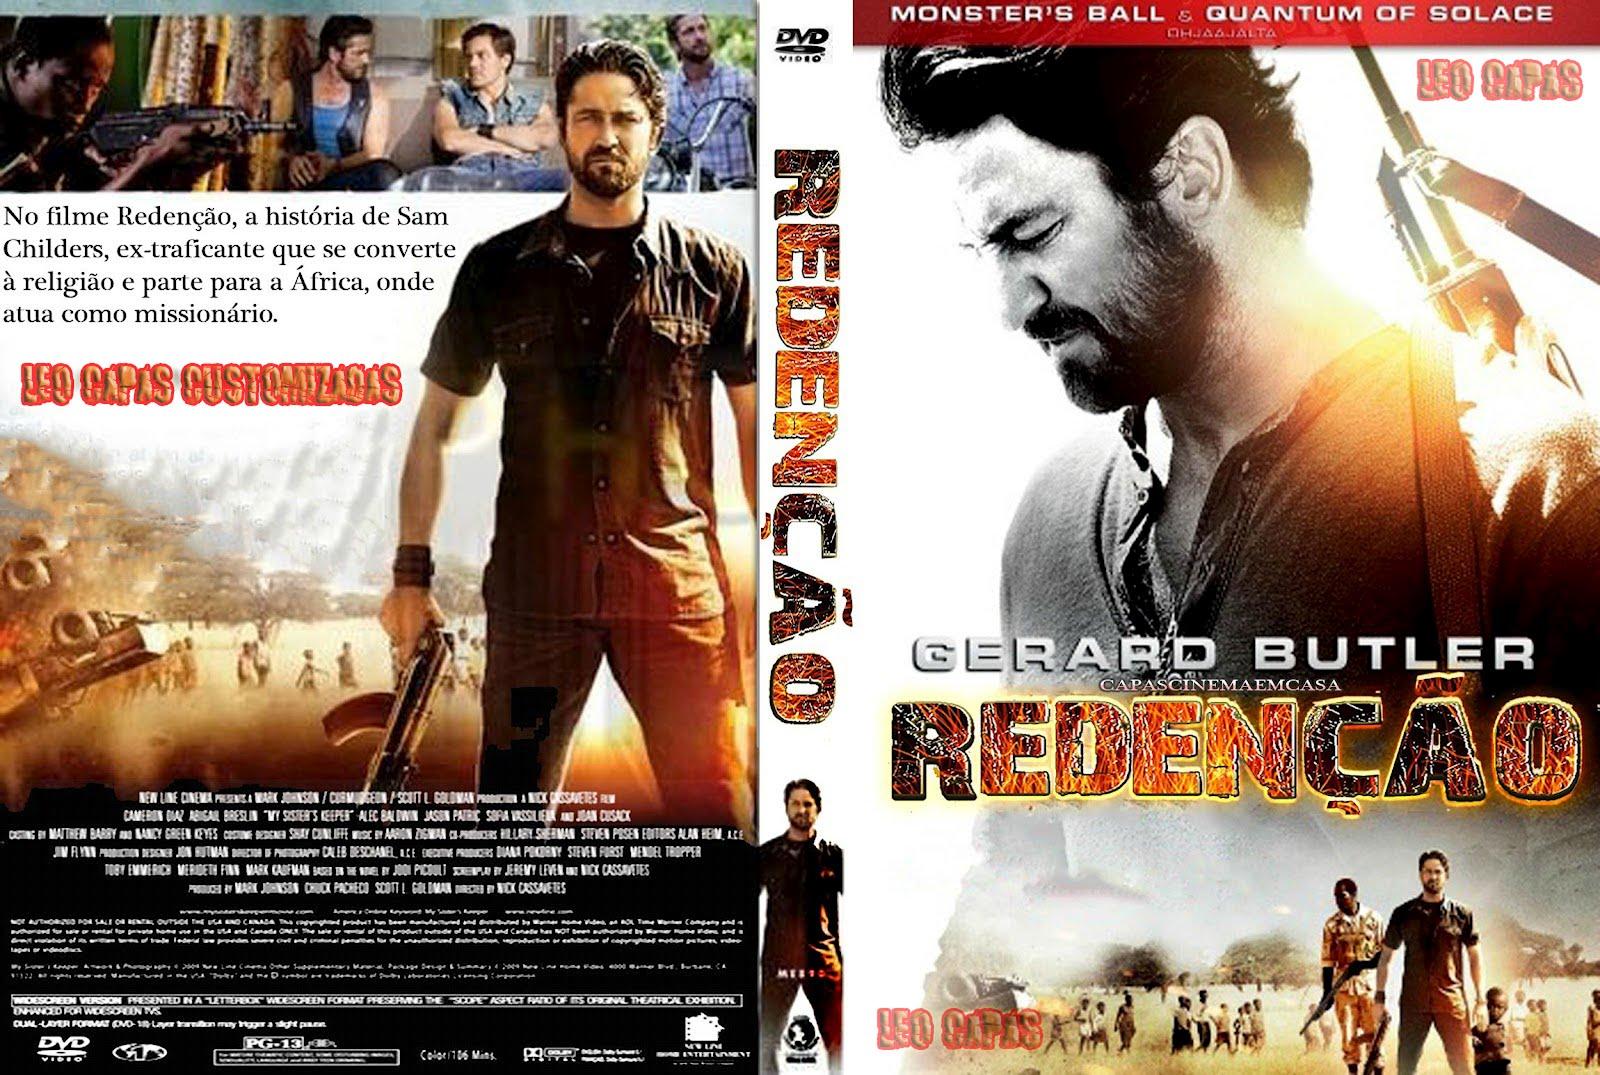 Redencao Machine Gun Preacher DVD Cover